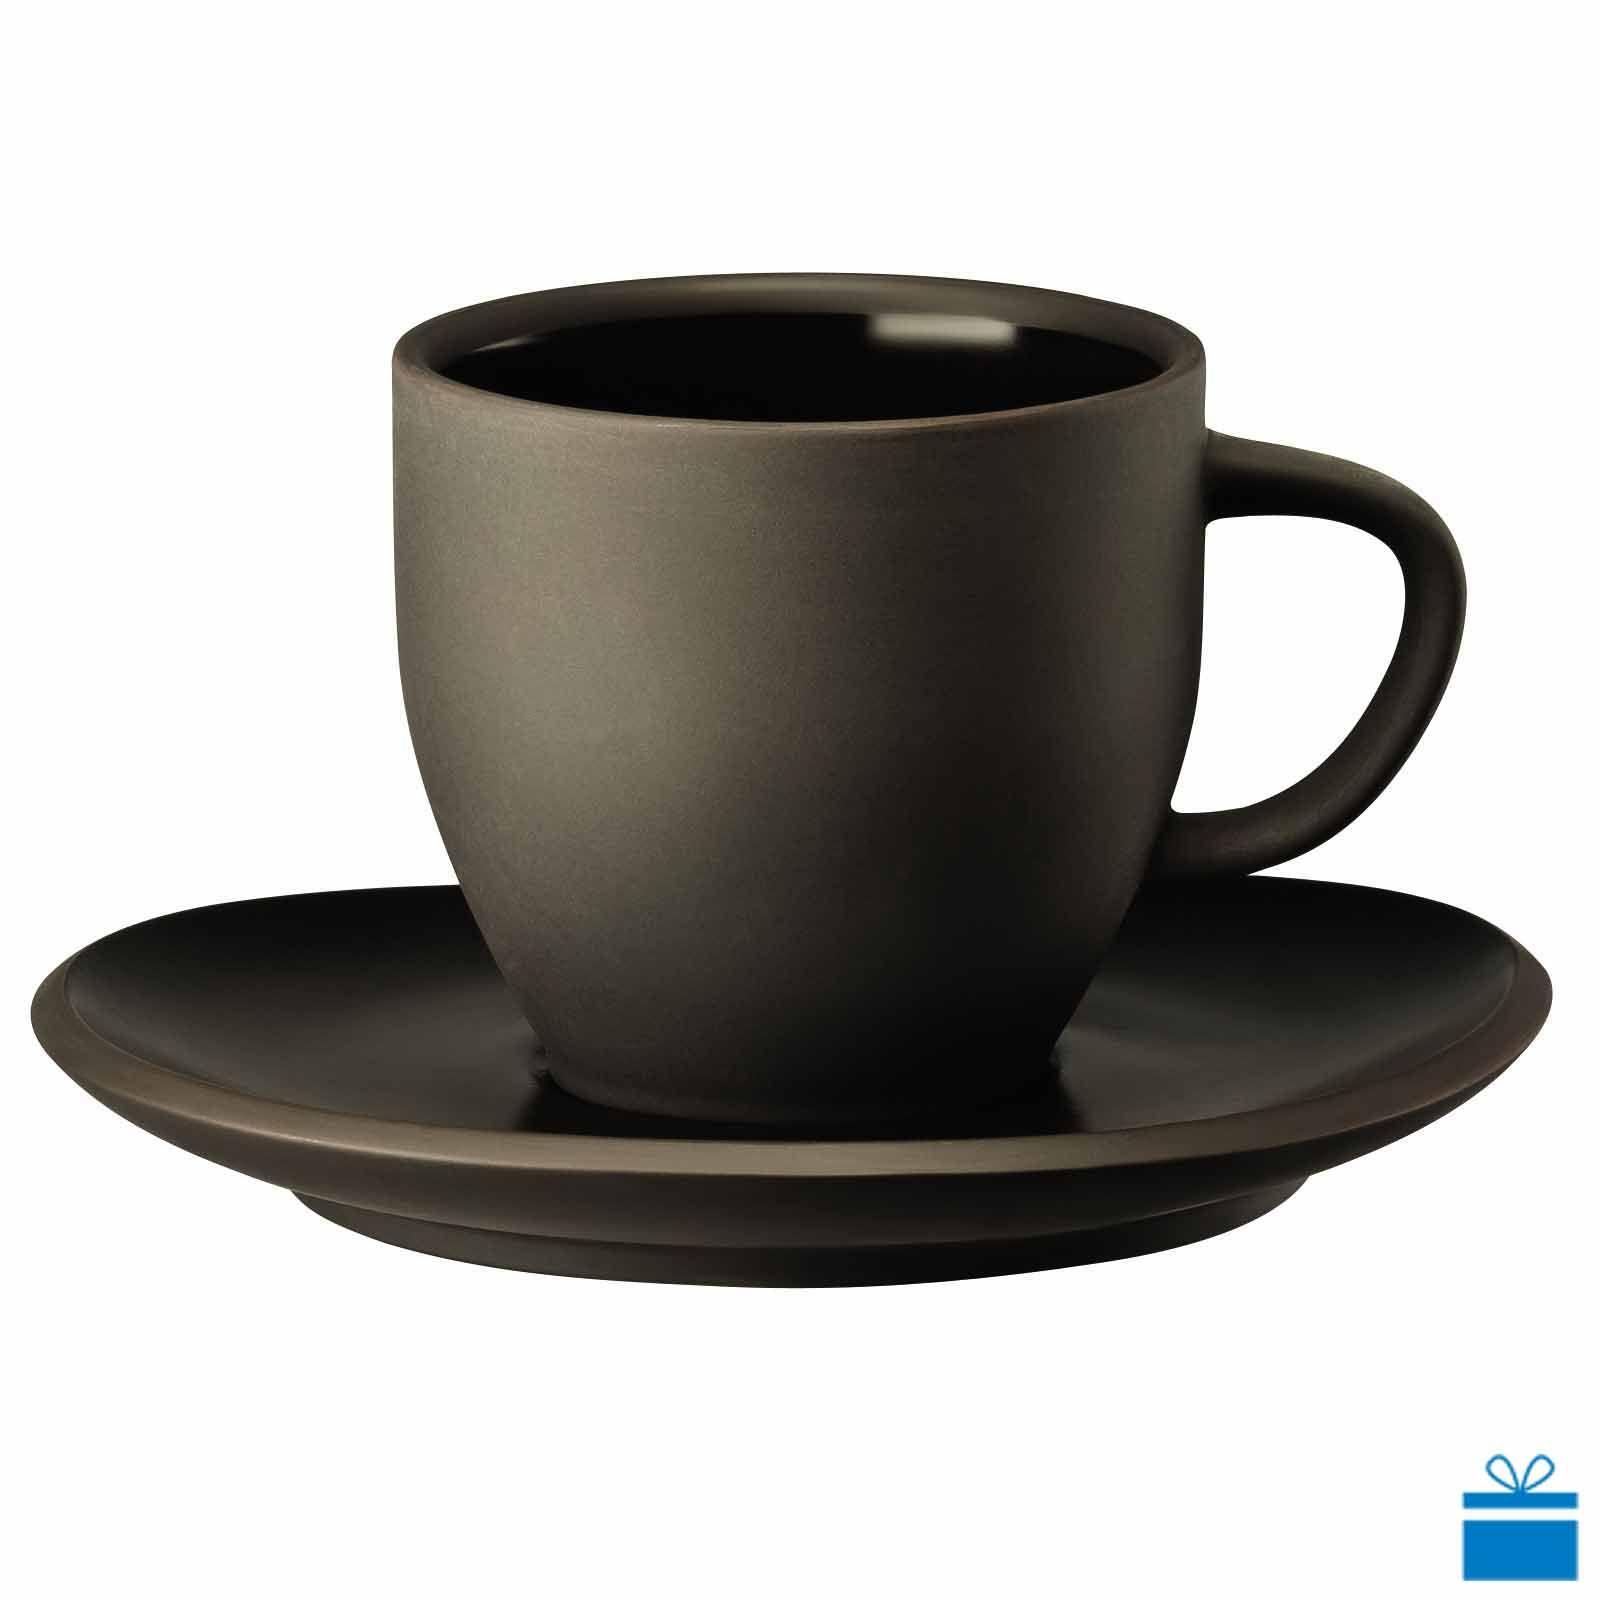 Steinzeug Steingut rosenthal neuheit serie junto slategrey tassenset kaffeetasse